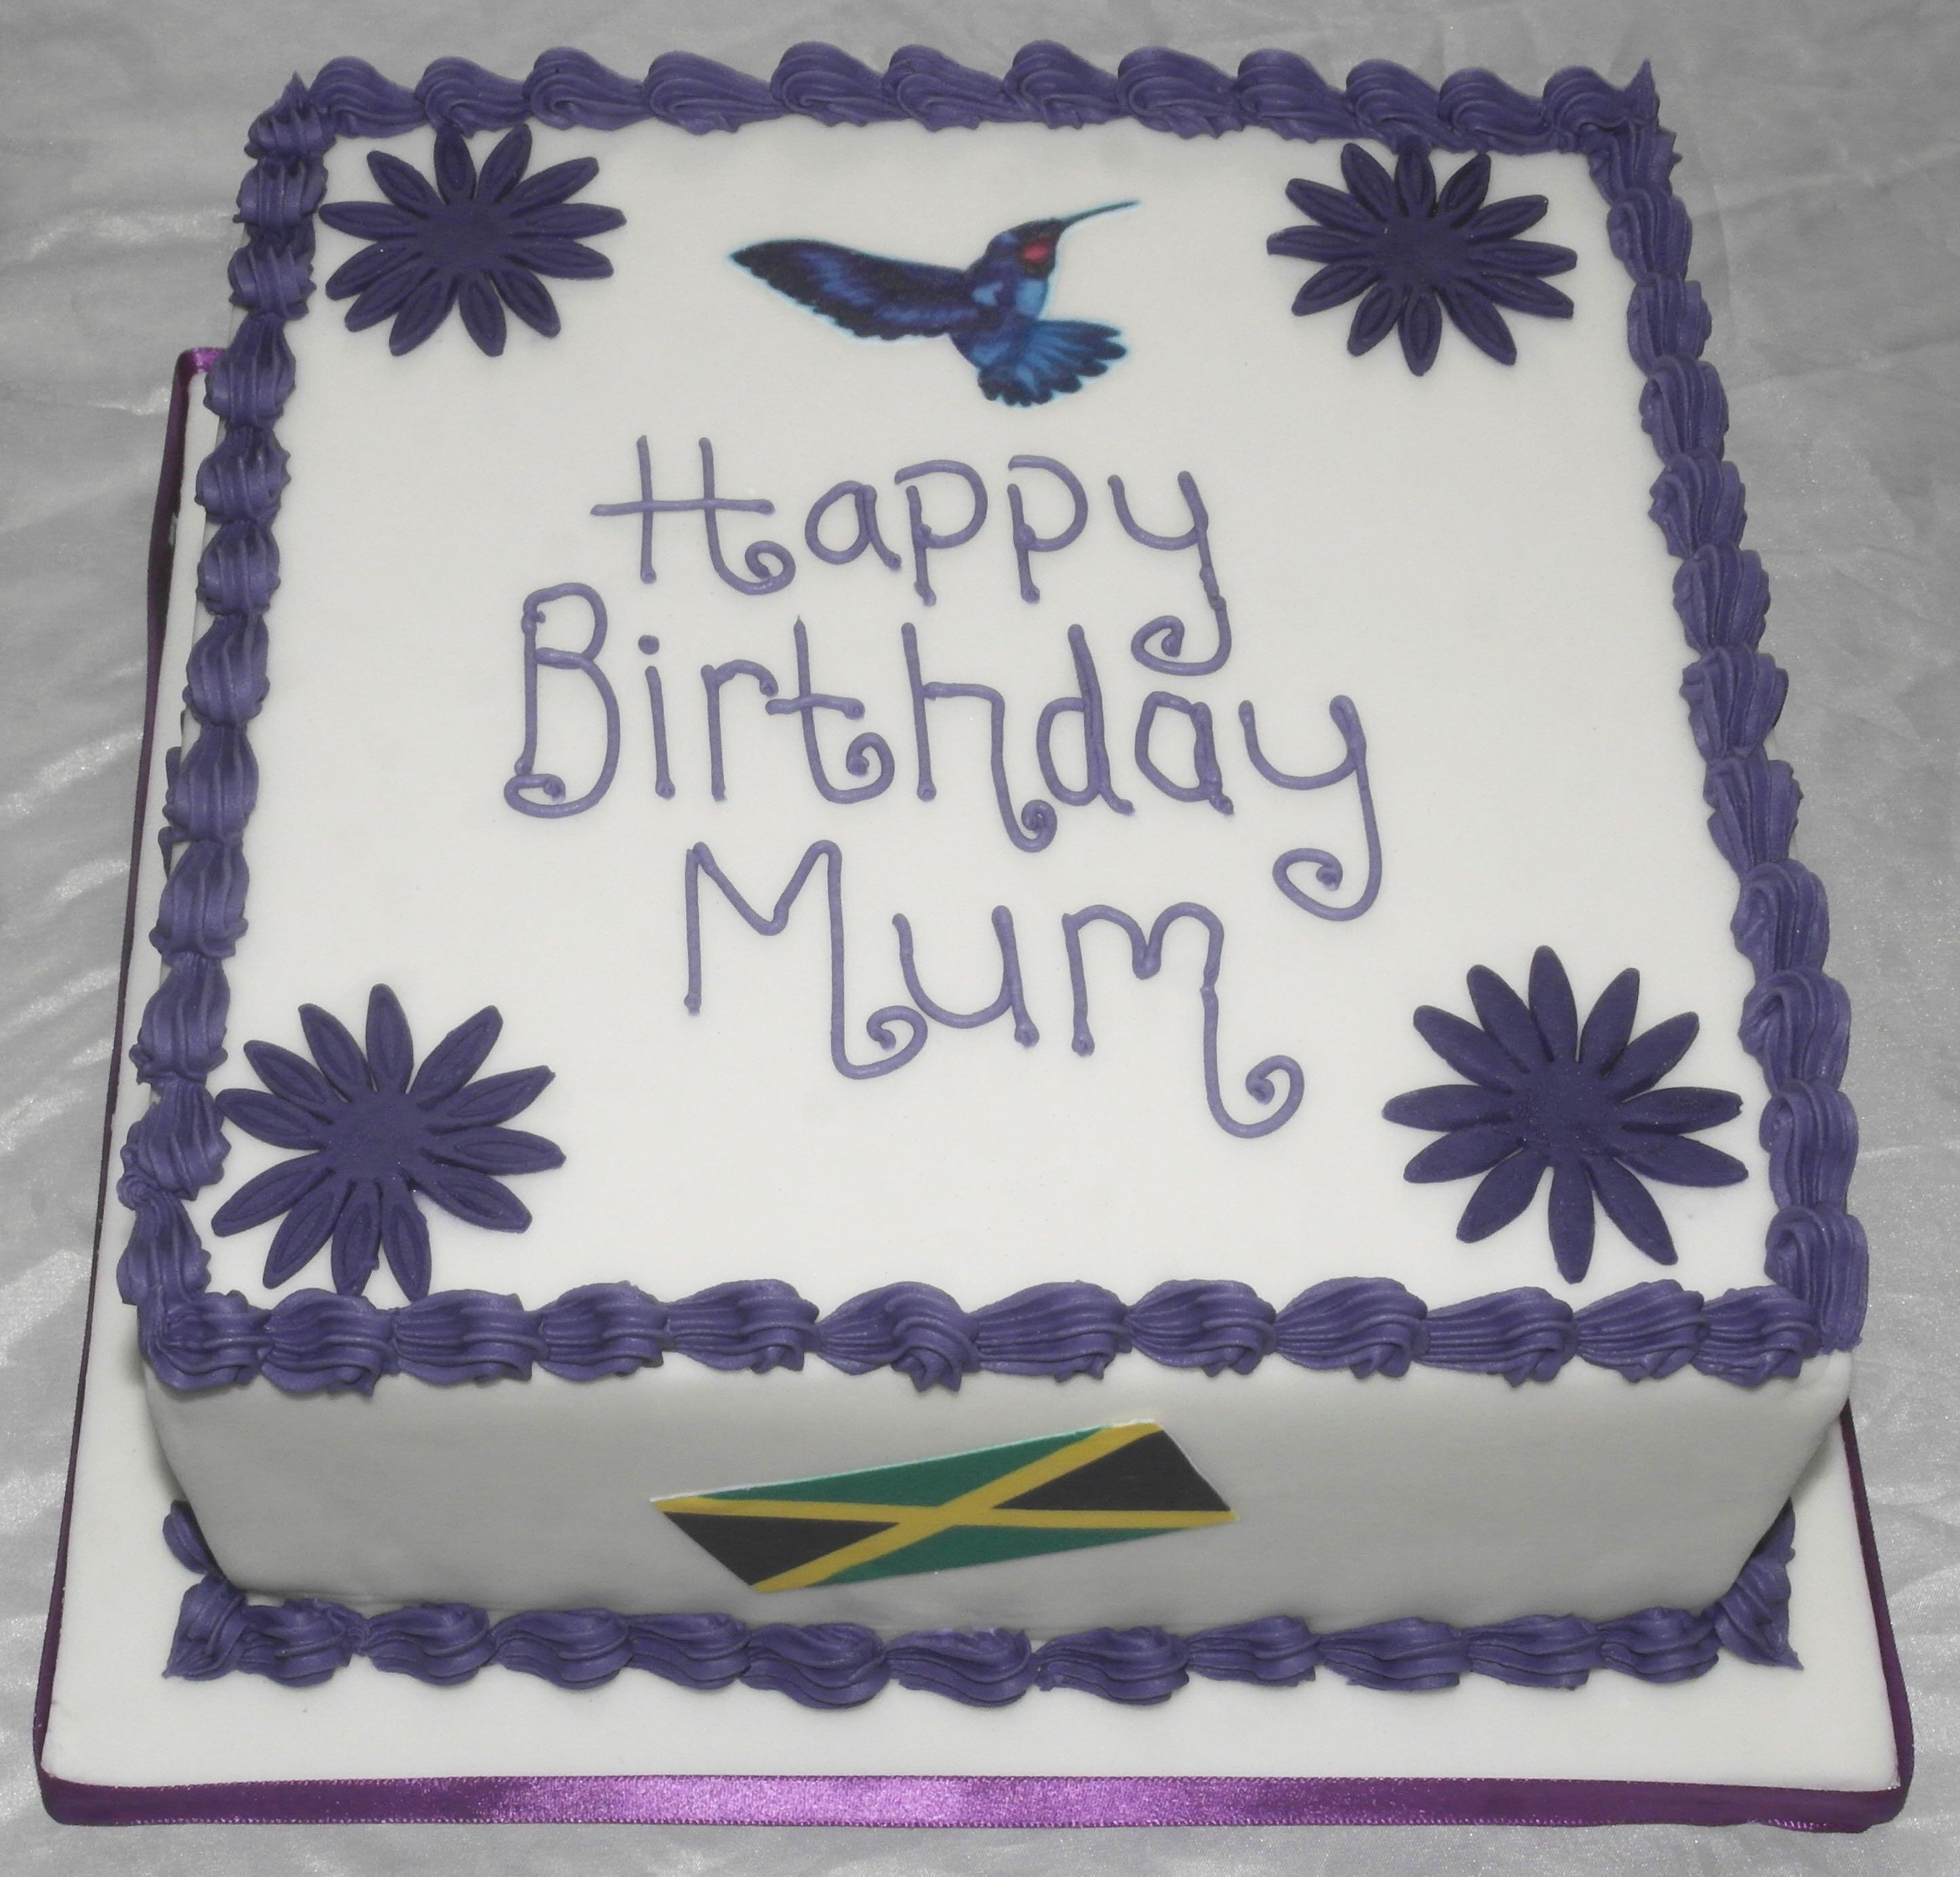 Jamaica Flag and Hummingbird Birthday Cake